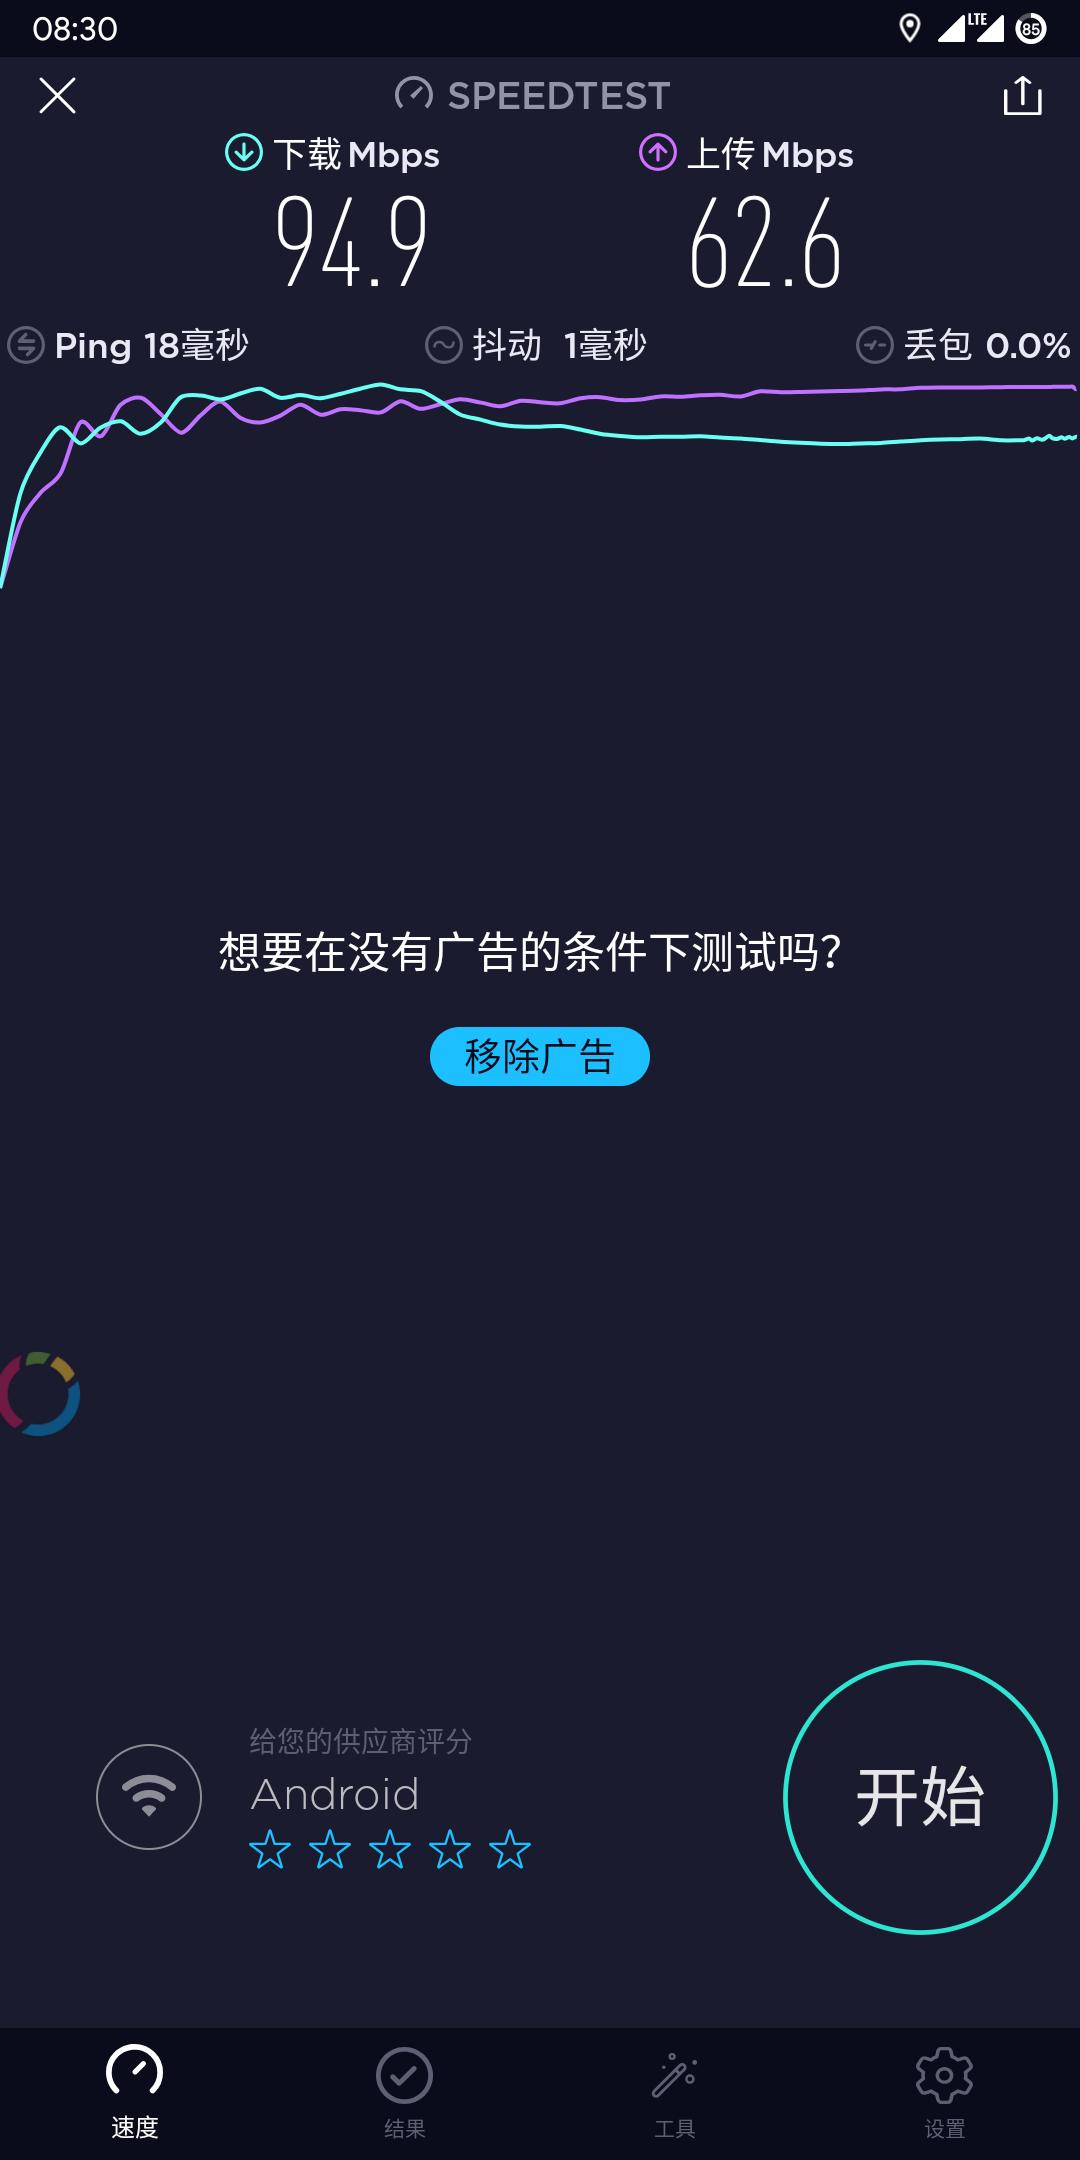 Screenshot_20190905-083059_Speedtest.png